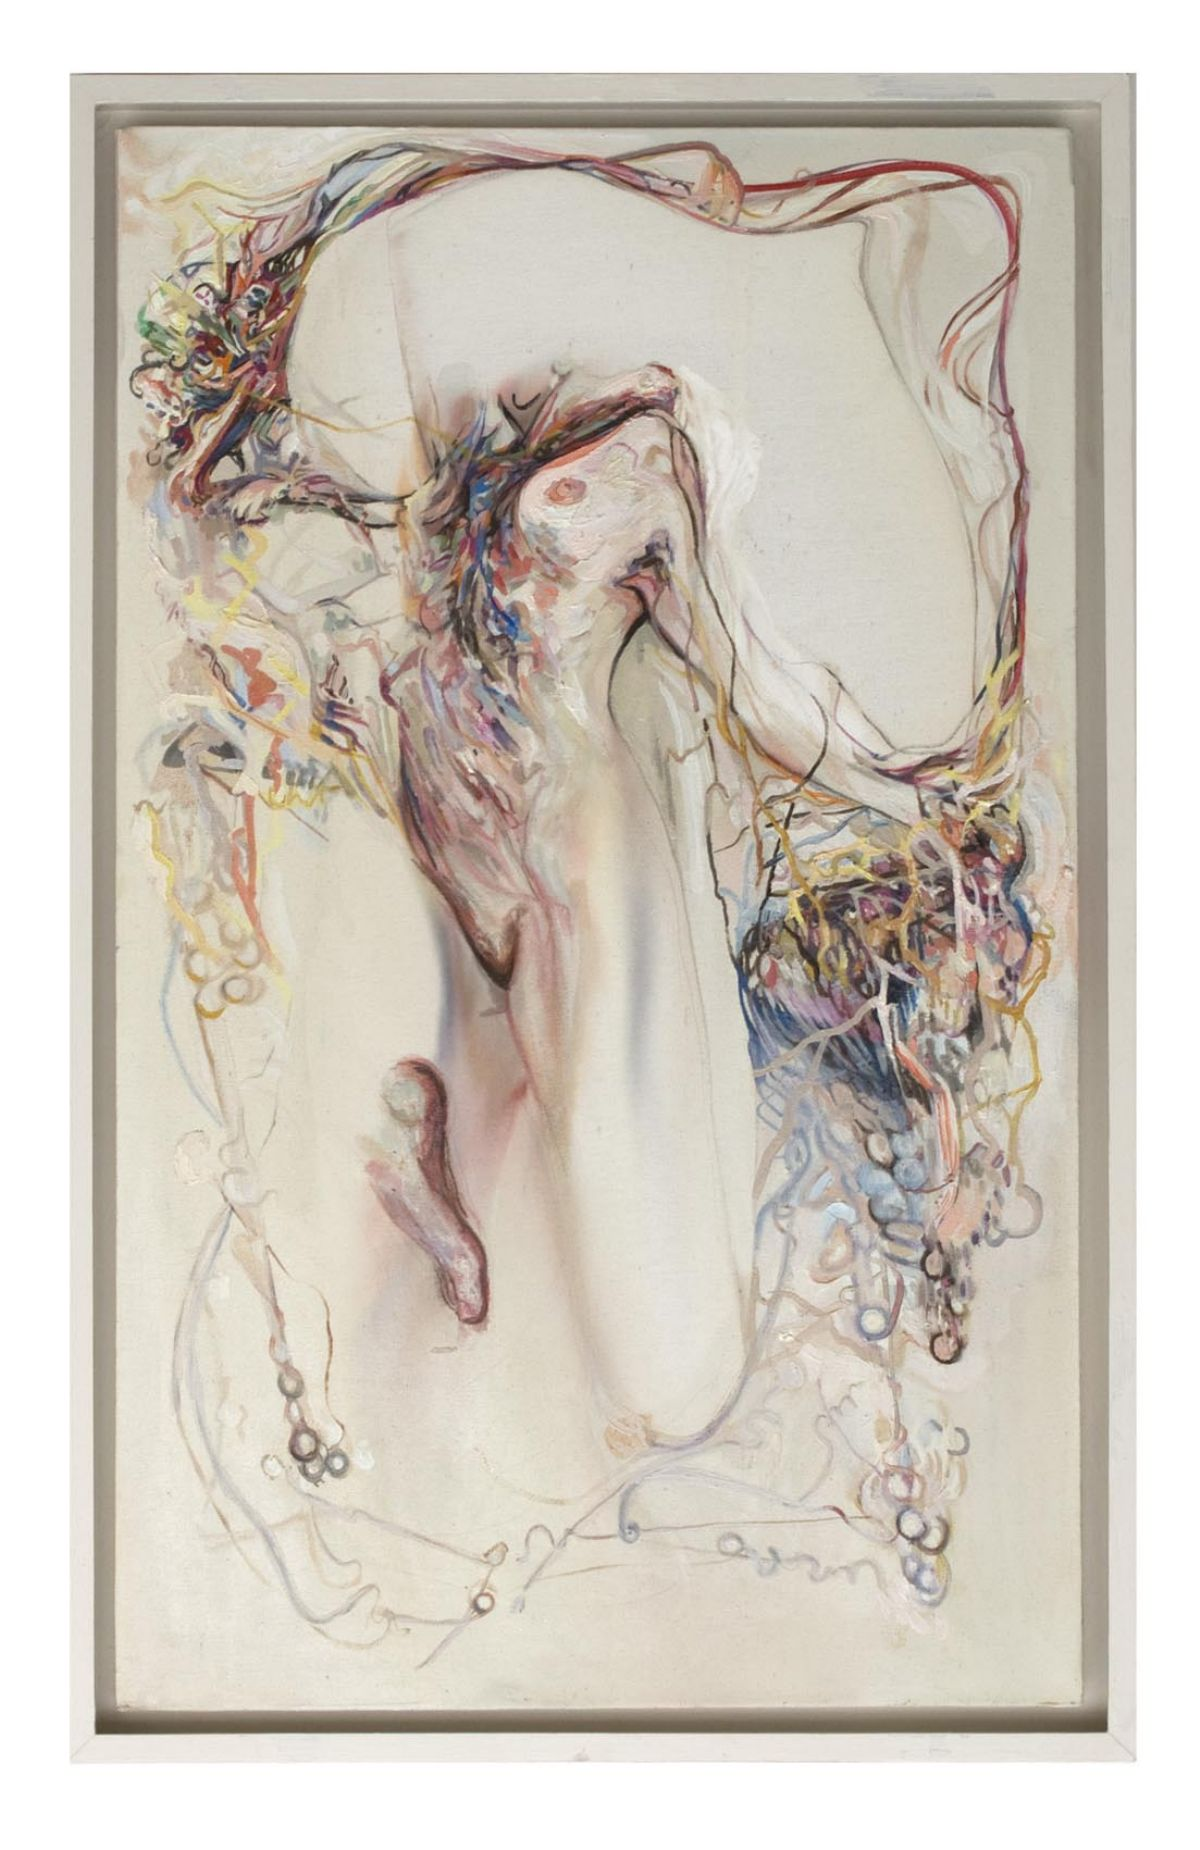 Mermaids Purse artwork by Perdita Sinclair - art listed for sale on Artplode